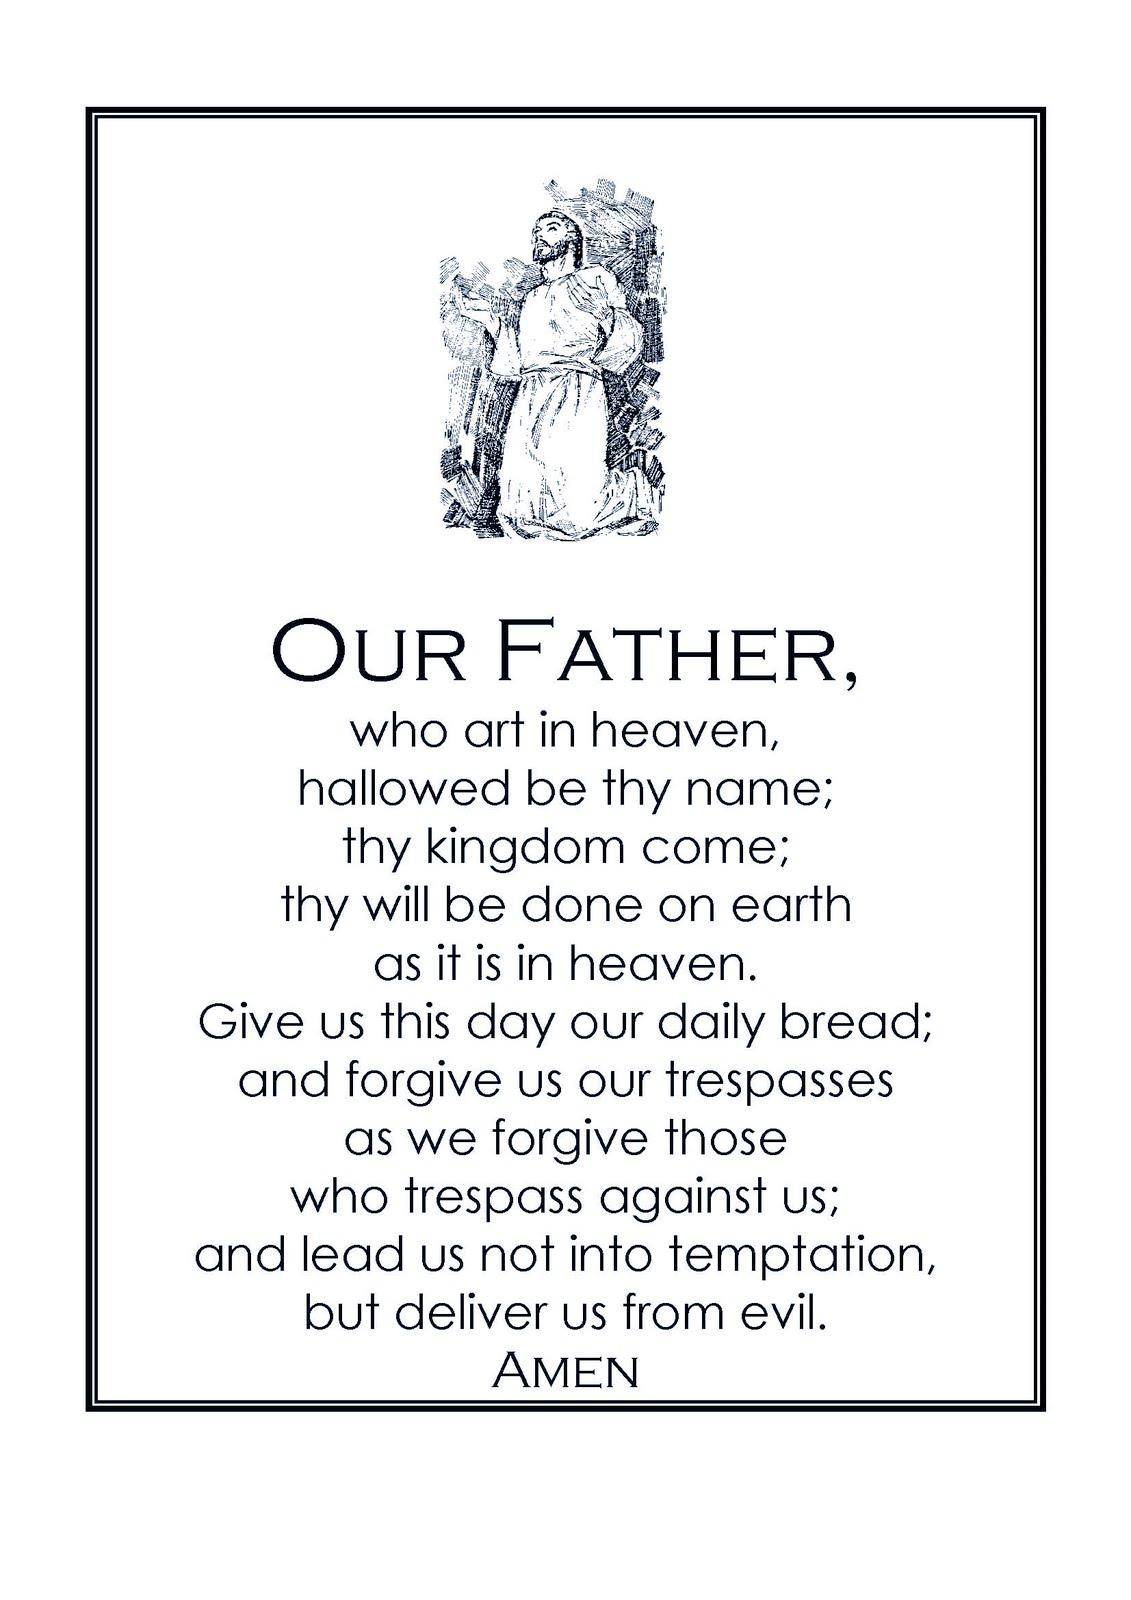 Gargantuan image with regard to printable our father prayer